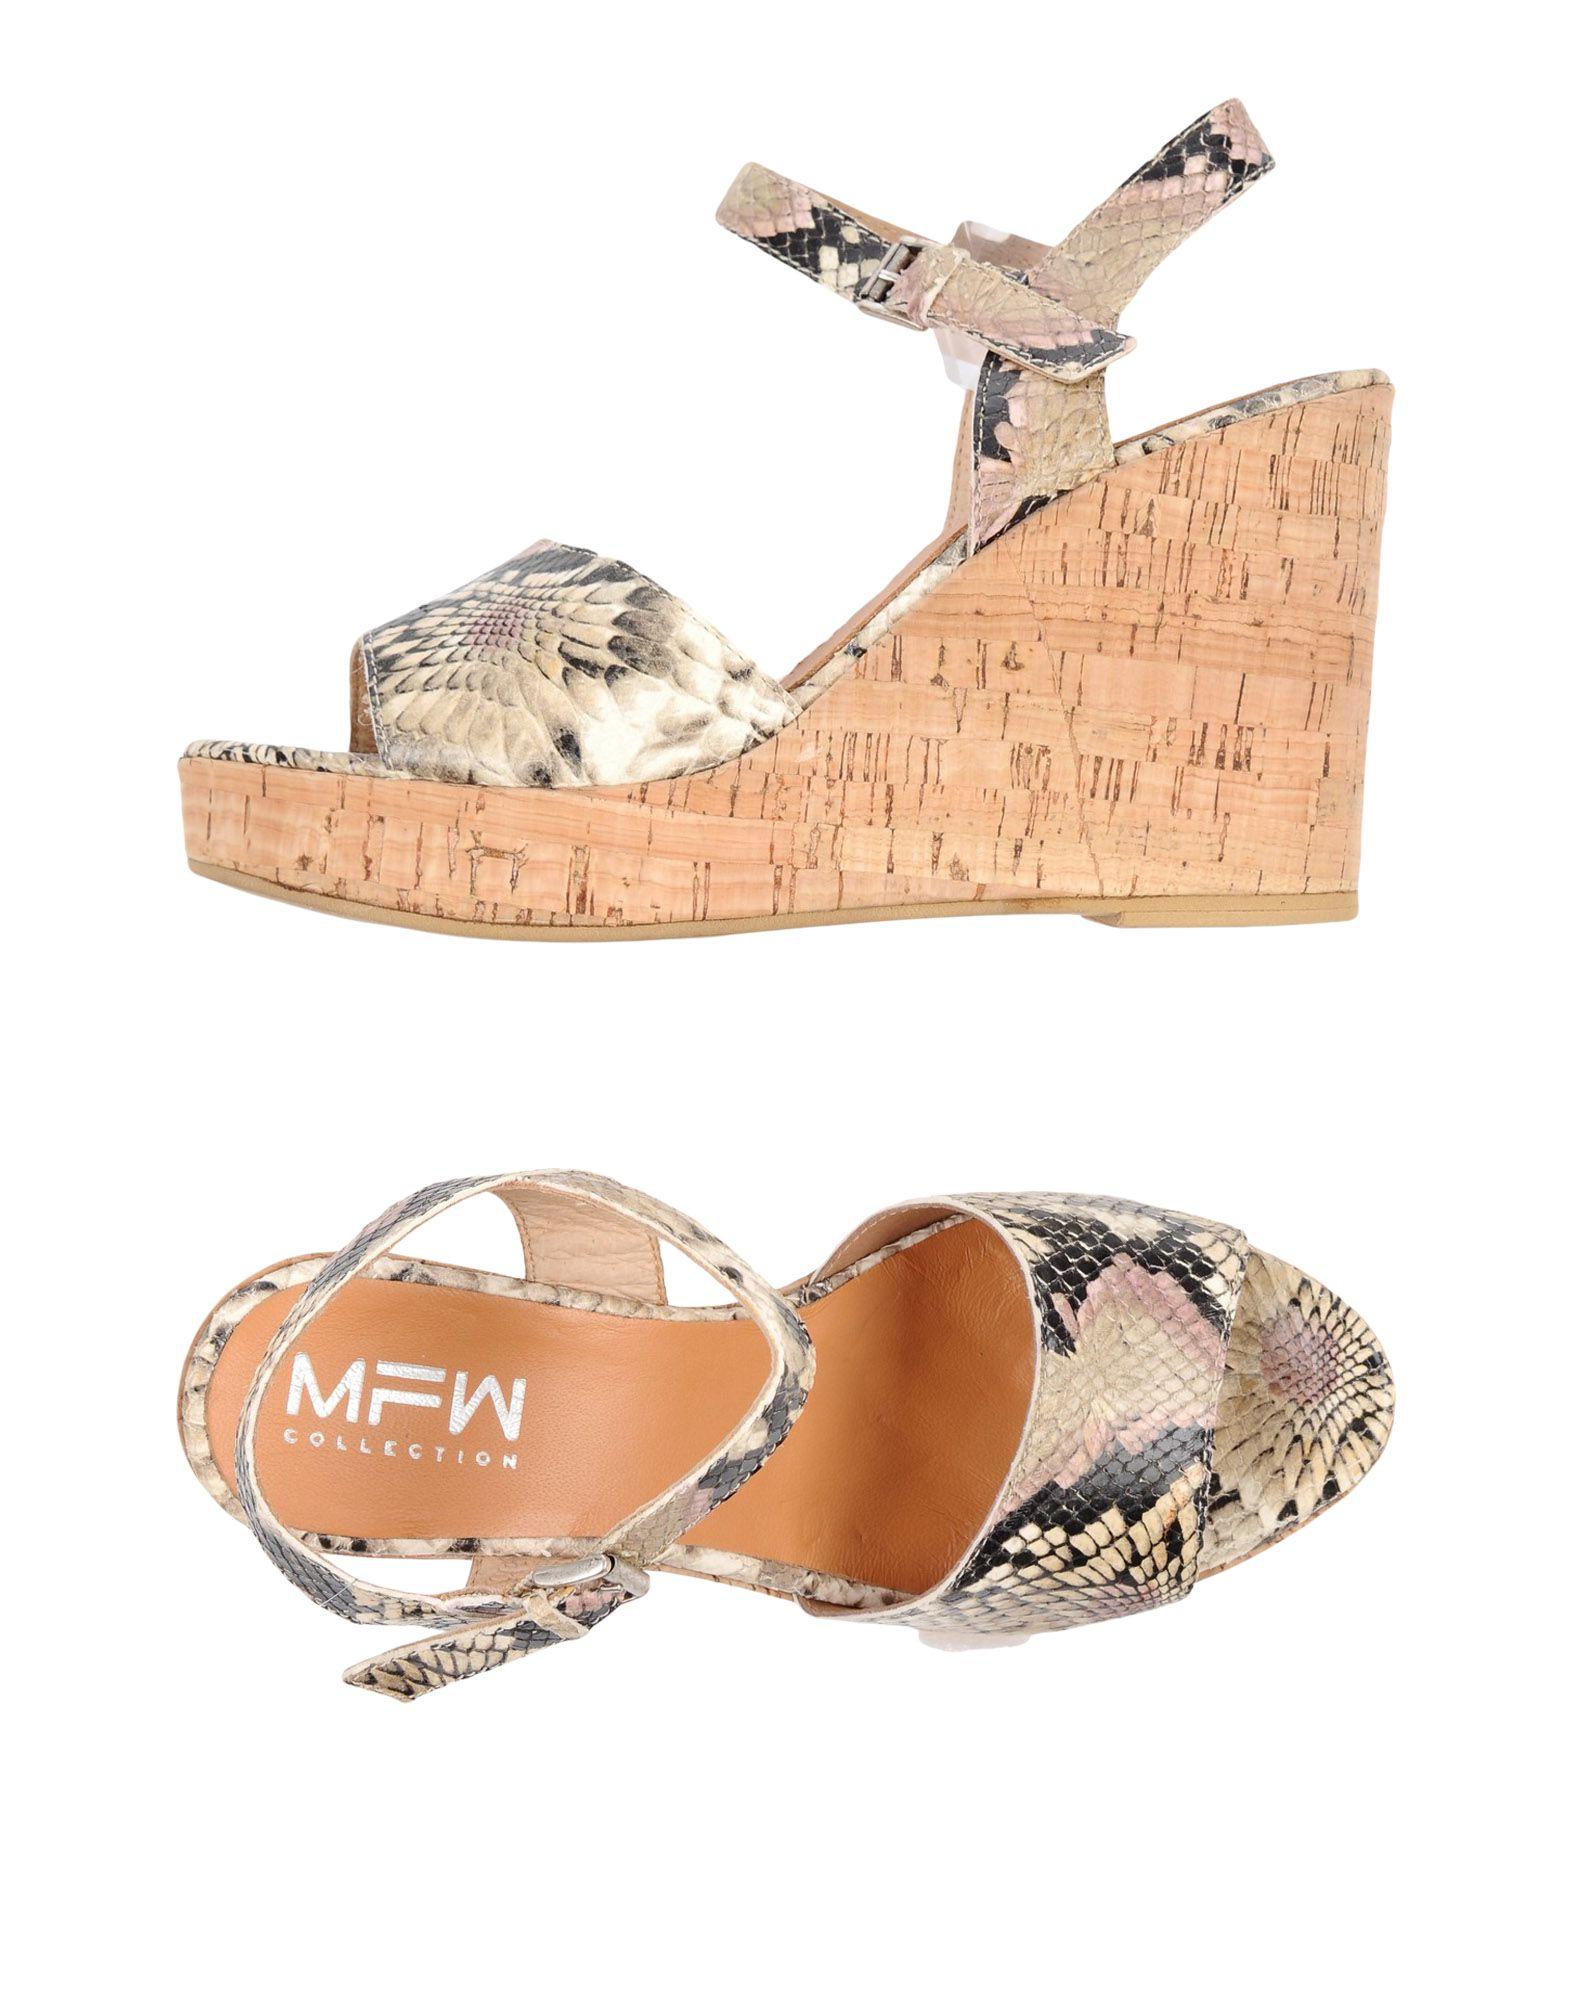 Mfw Collection Sandalen Damen  11473348XF Gute Qualität beliebte Schuhe